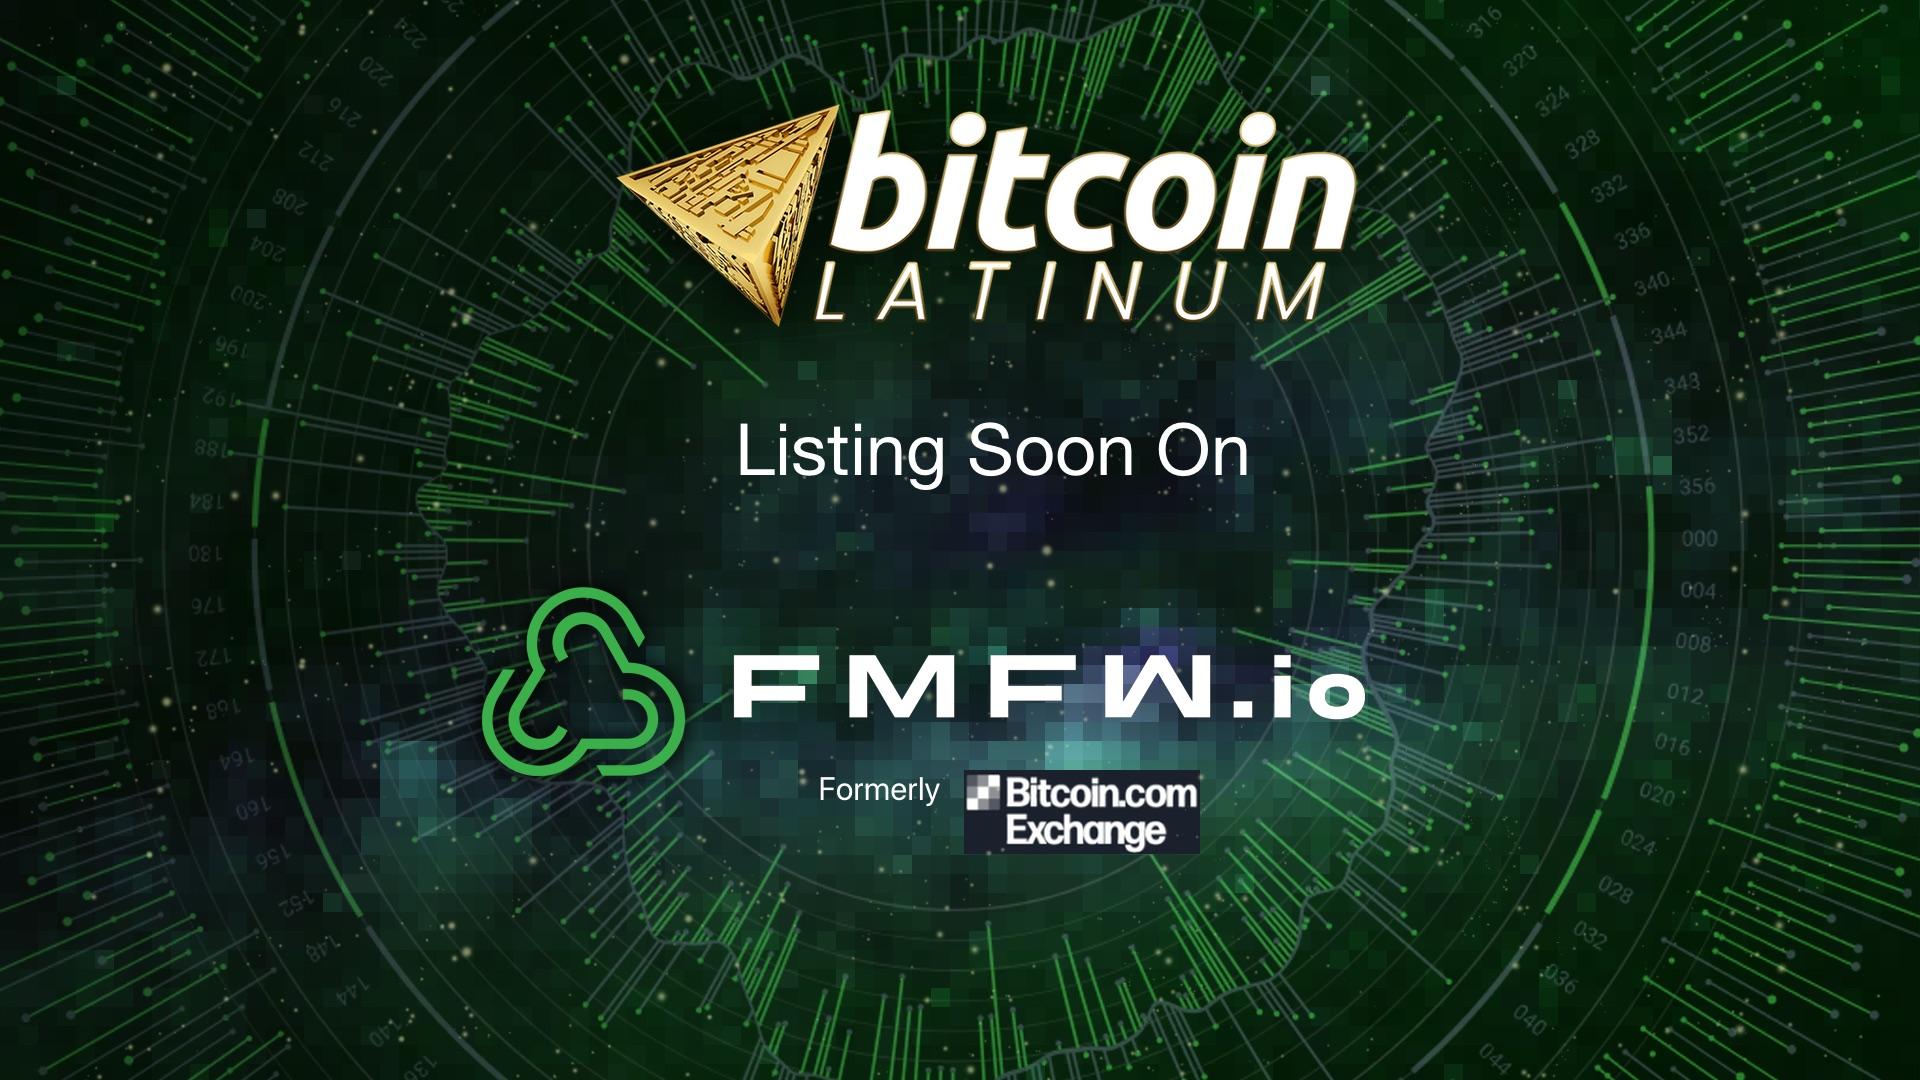 Next-generation Cryptocurrency Bitcoin Latinum (LTNM) To List on FMFW.io Exchange (formerly Bitcoin.com Exchange)